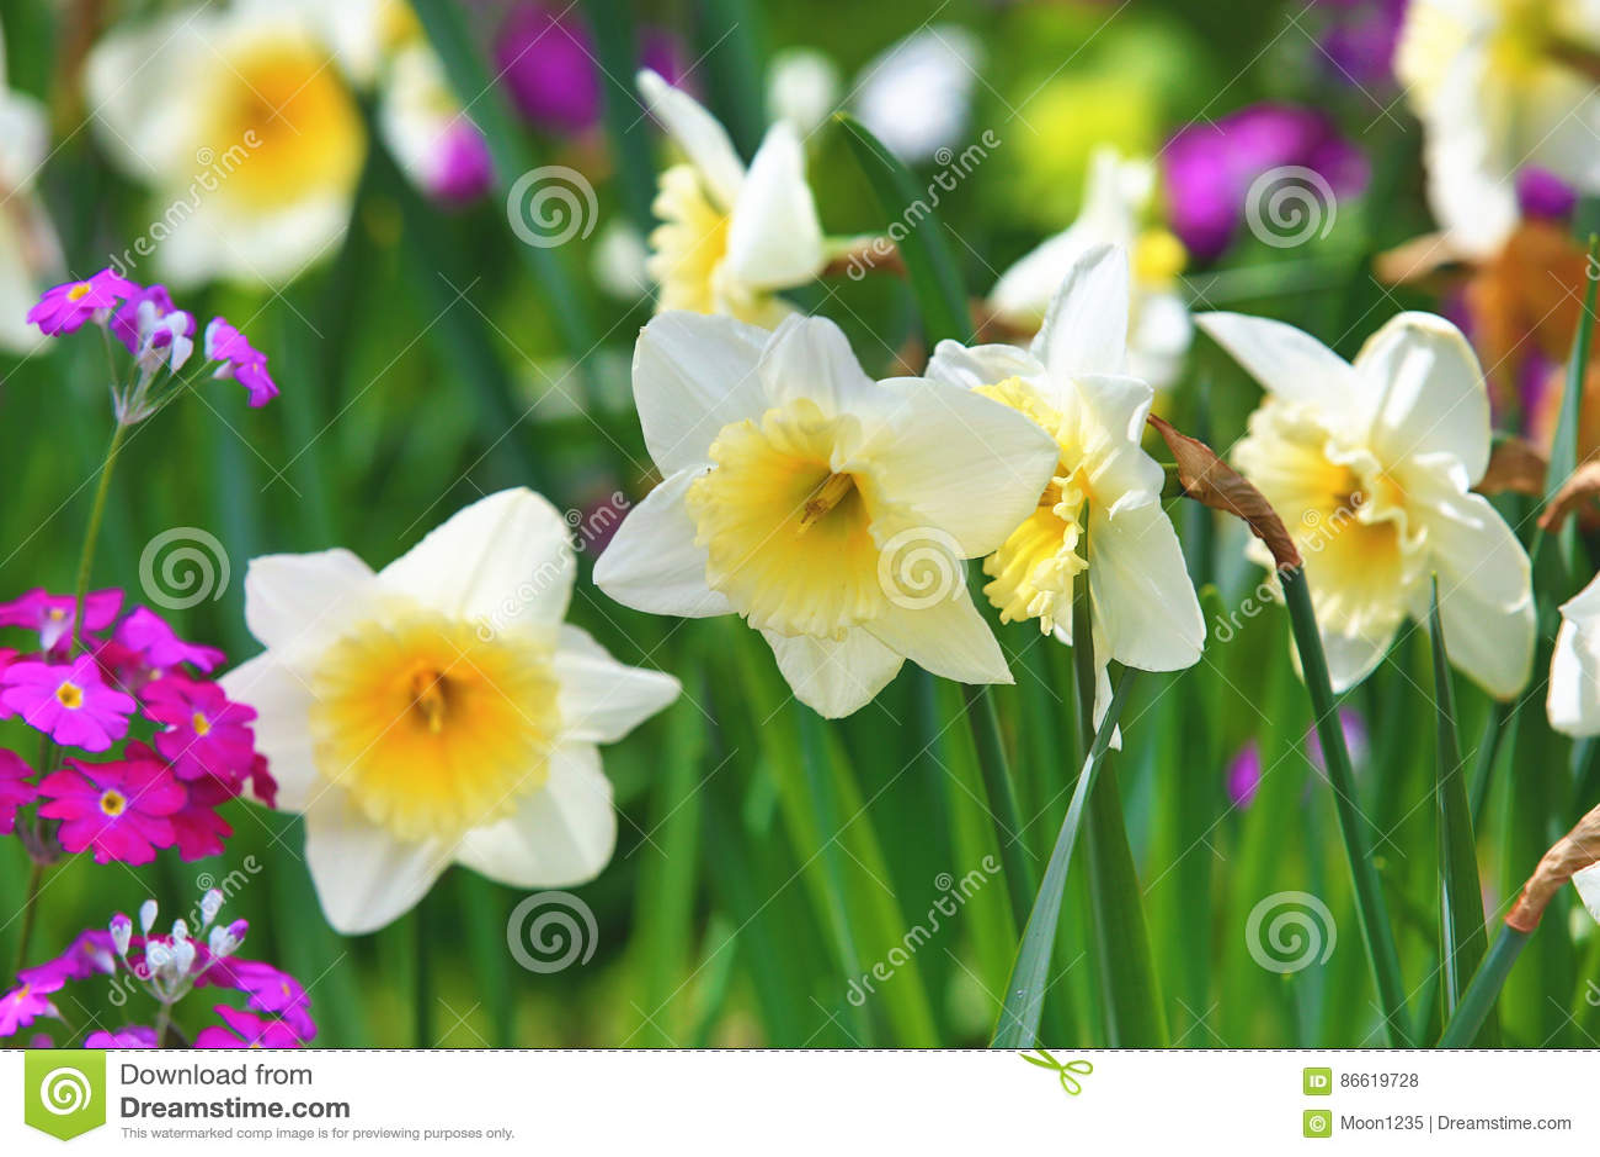 Beautiful scenery of daffodil flowers stock photo image of foliage beautiful scenery of daffodil flowers izmirmasajfo